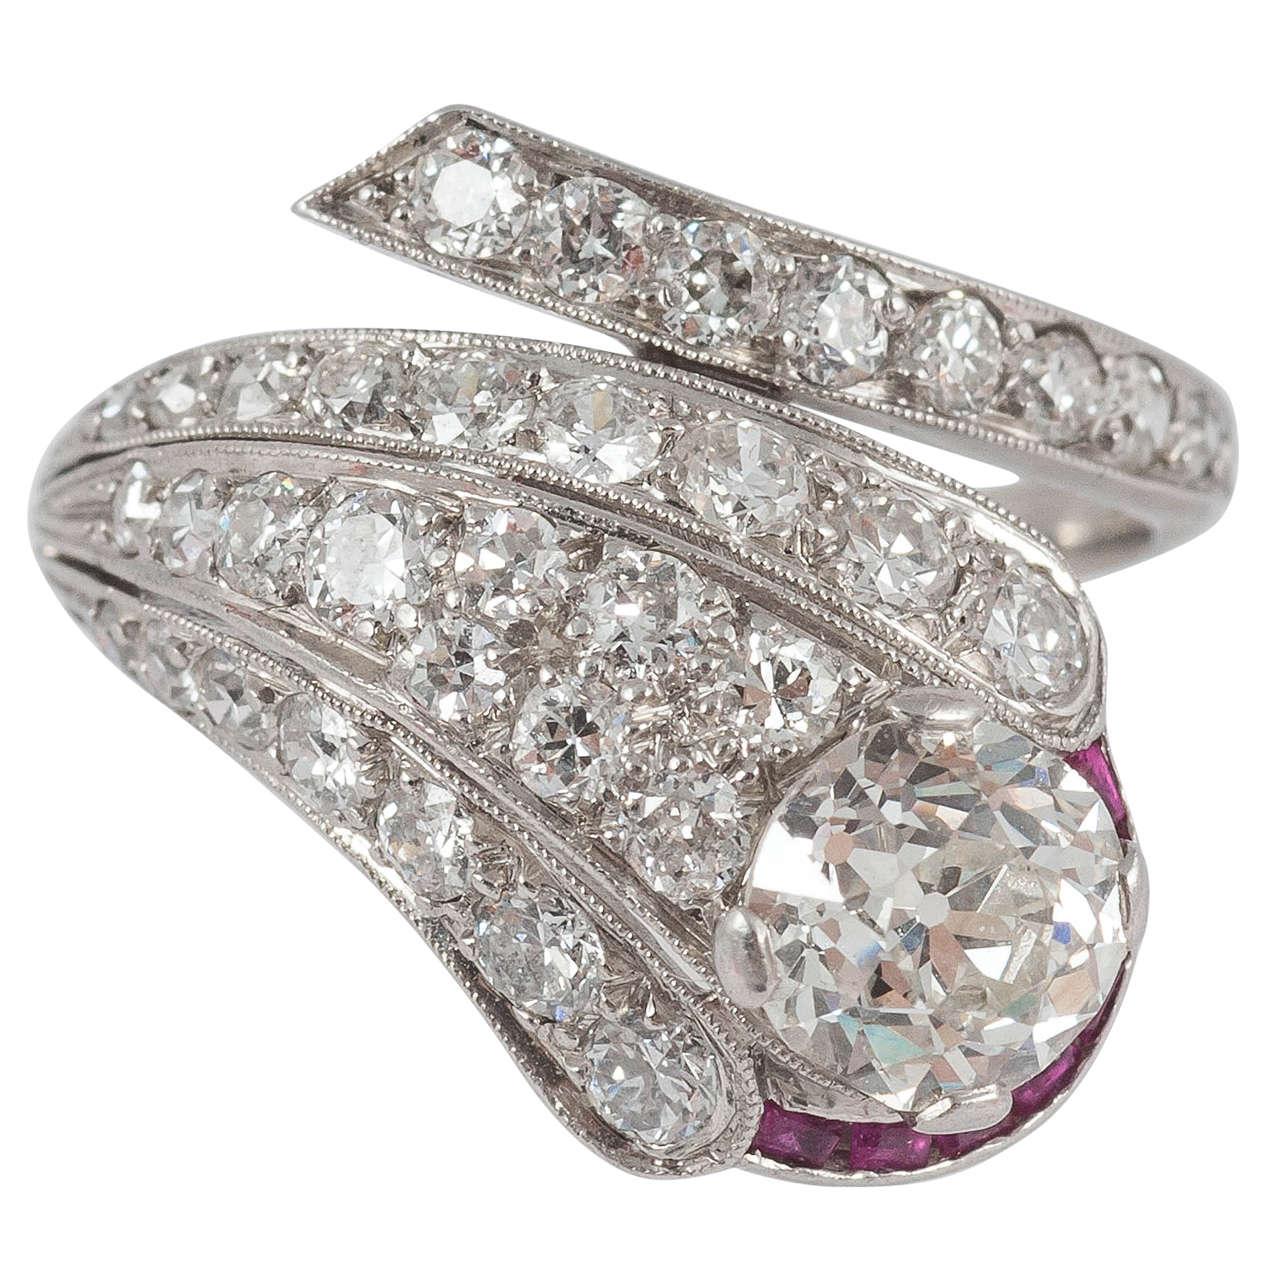 Edwardian Ruby Diamond Platinum Serpent Ring